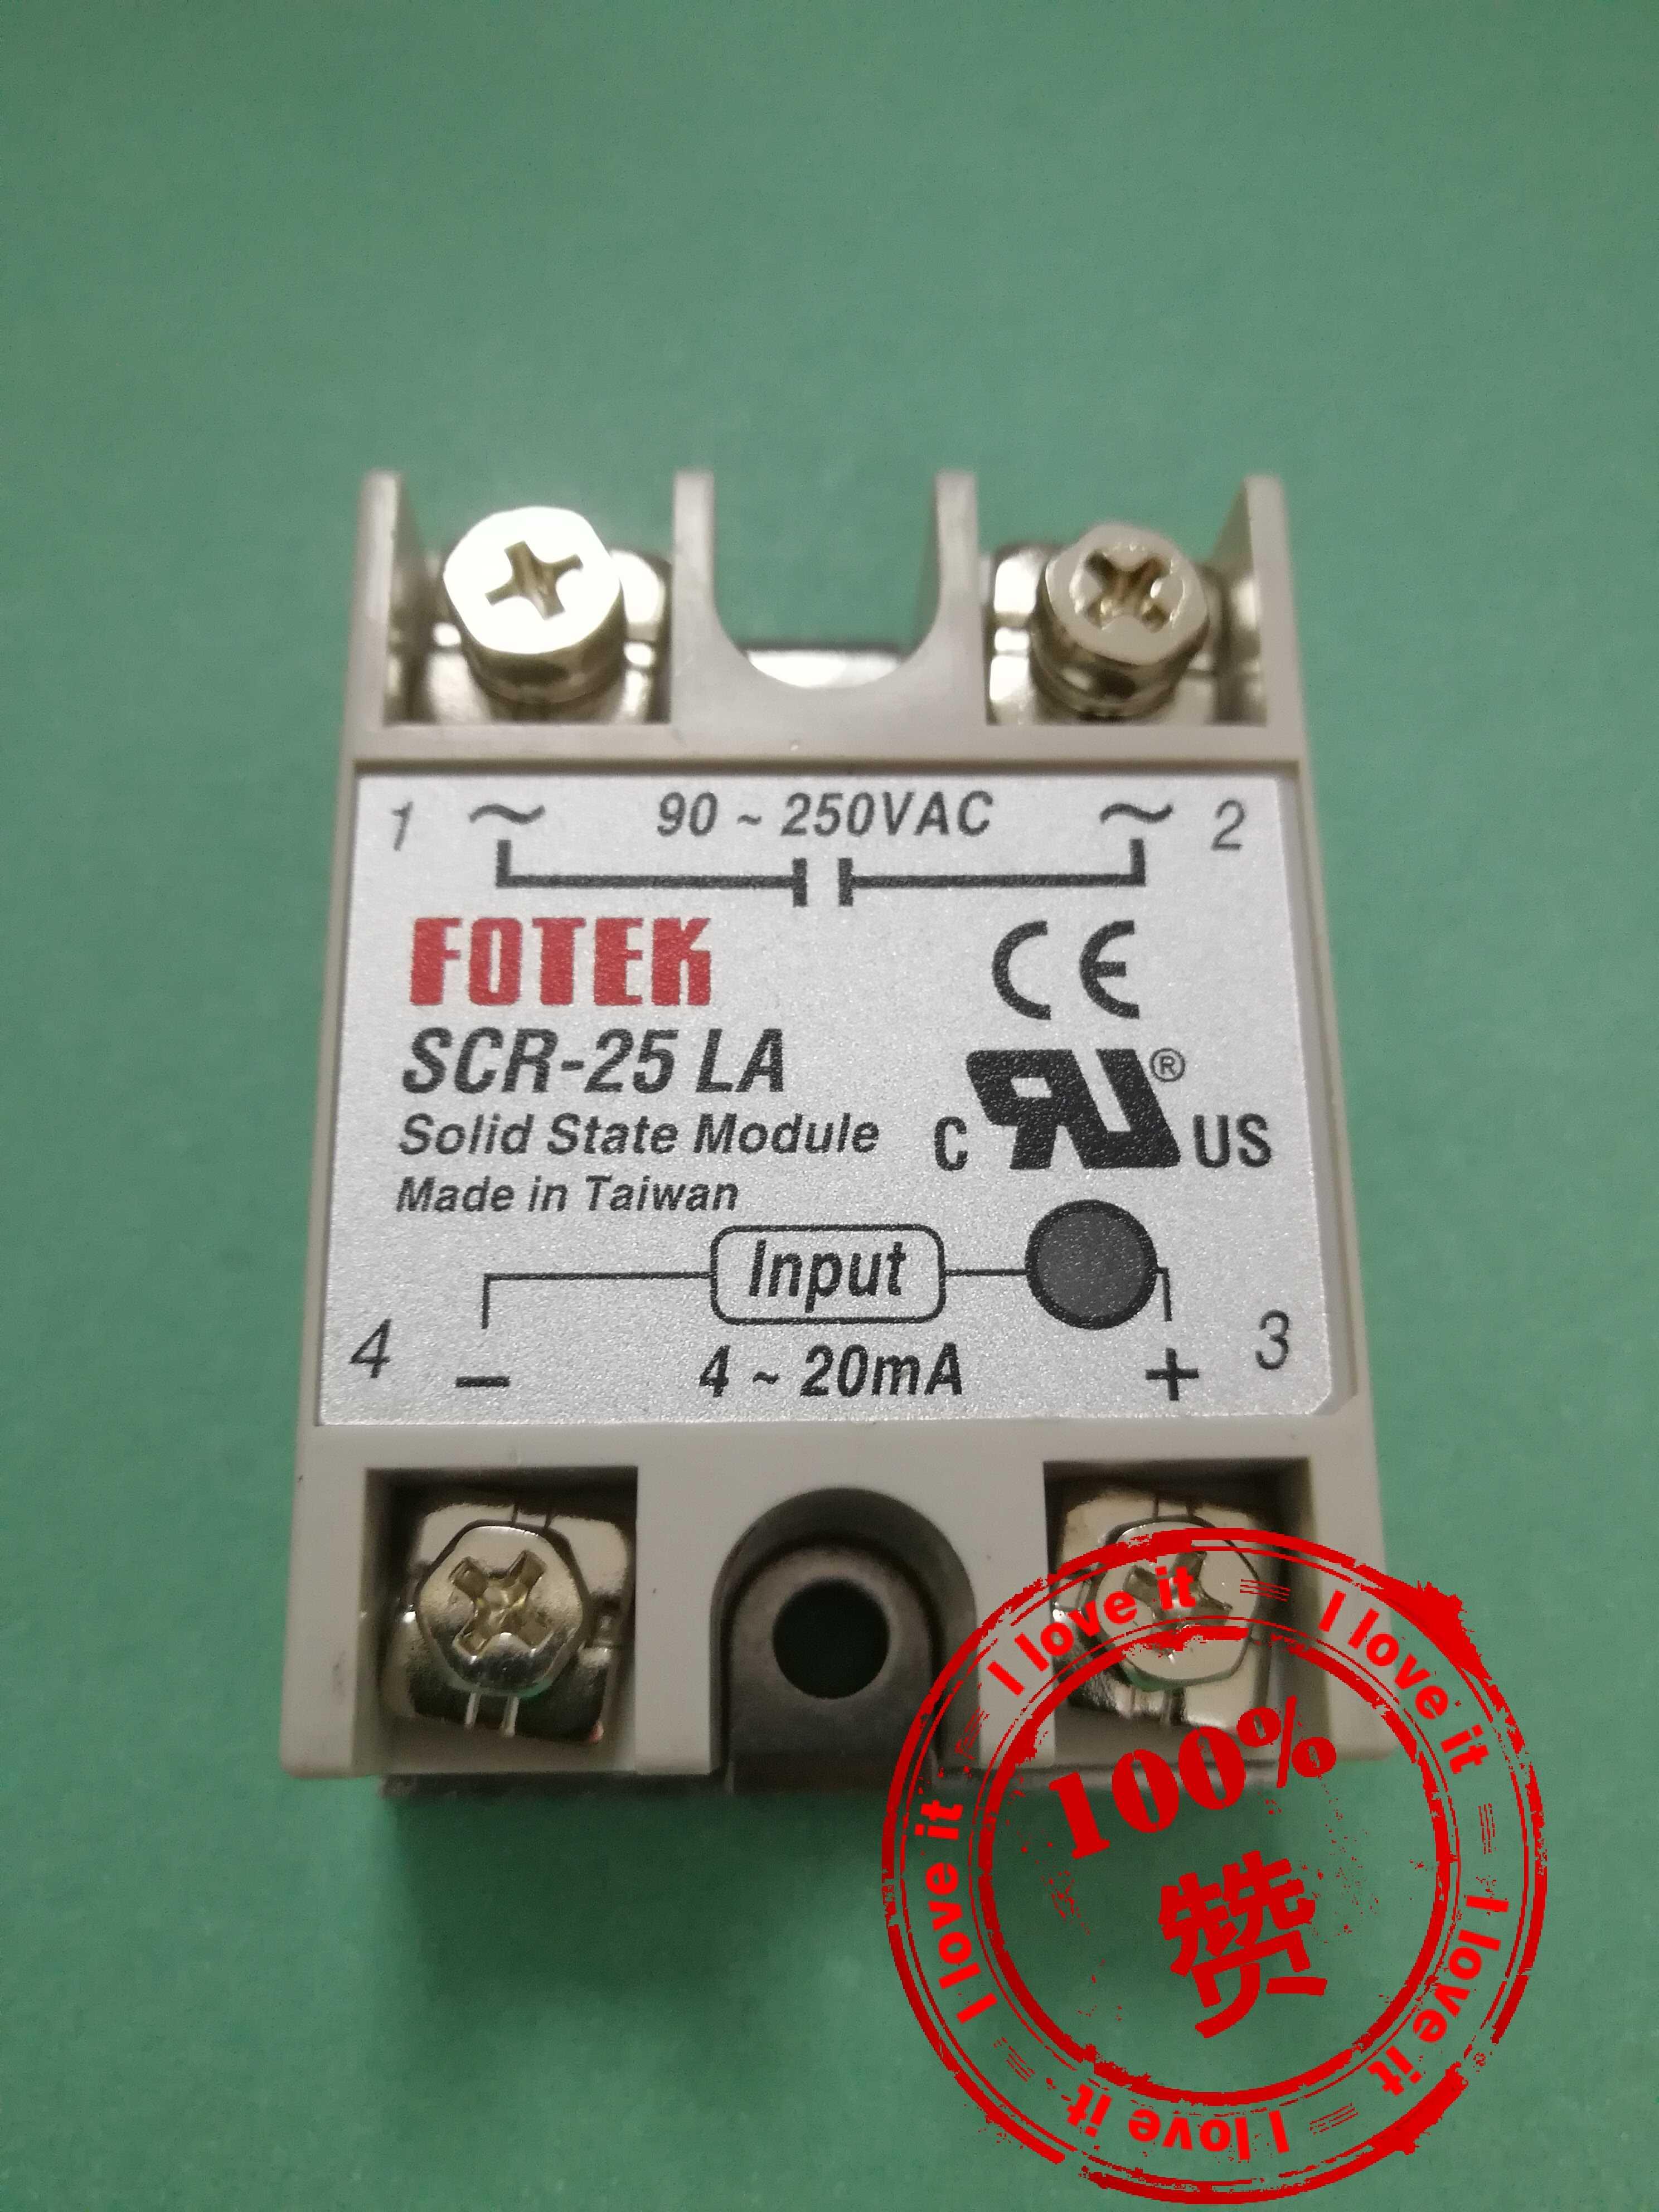 Solid state relay Voltage regulating module 4-20mA SCR-25LASolid state relay Voltage regulating module 4-20mA SCR-25LA